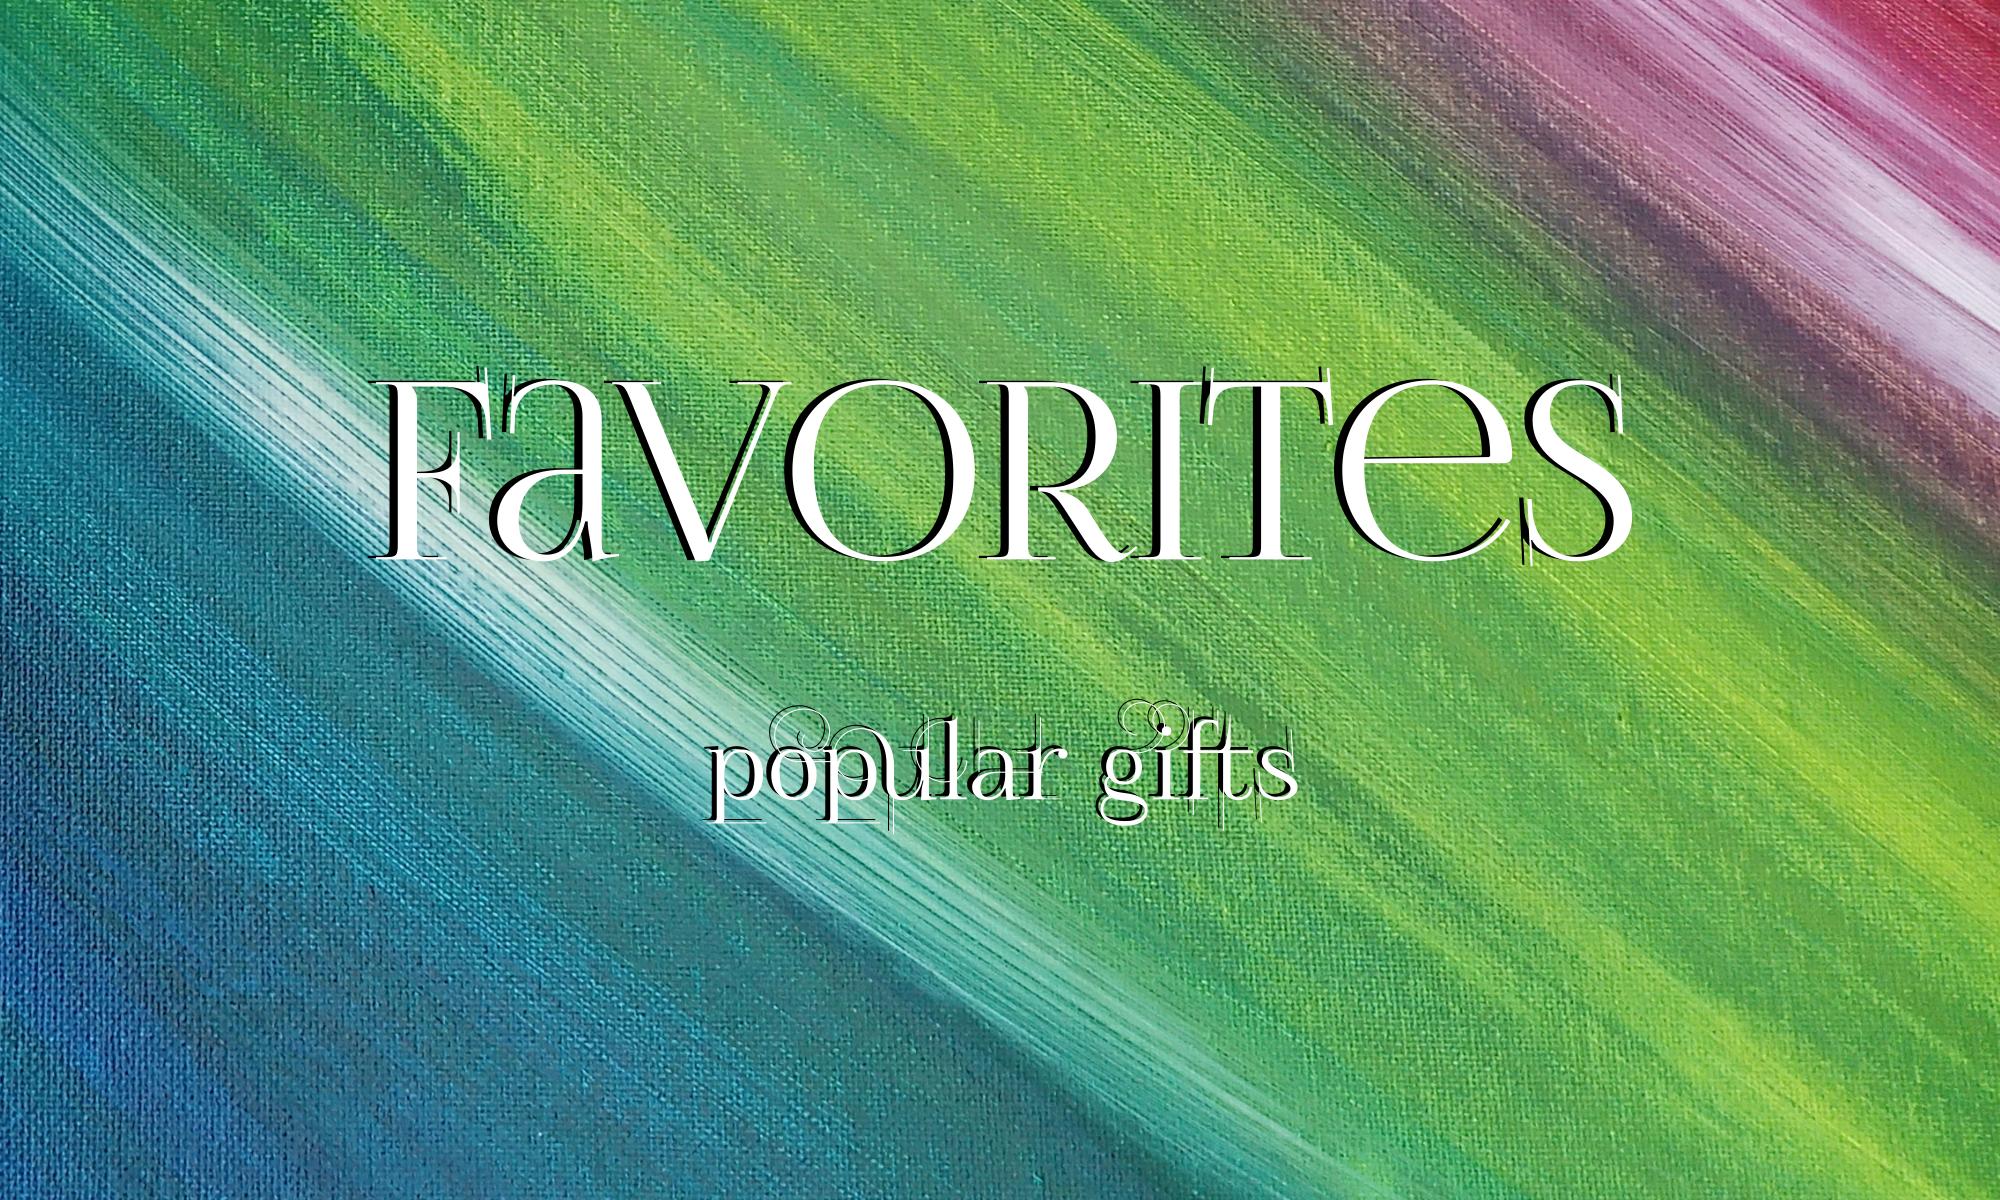 Favorites - popular gifts